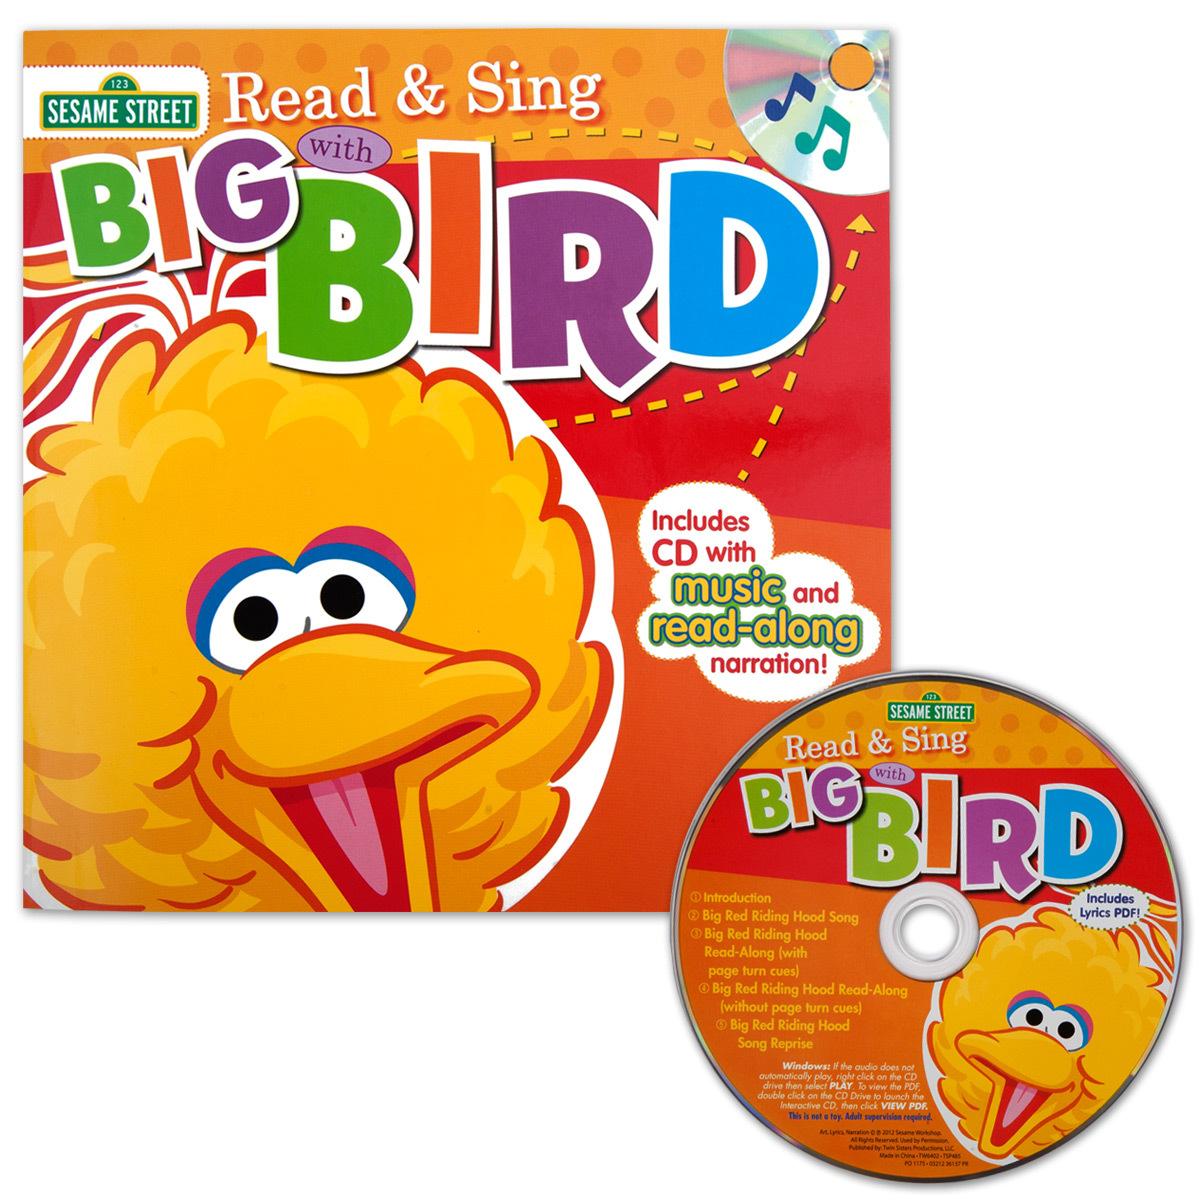 Sesame Street Read & Sing with Big Bird CD